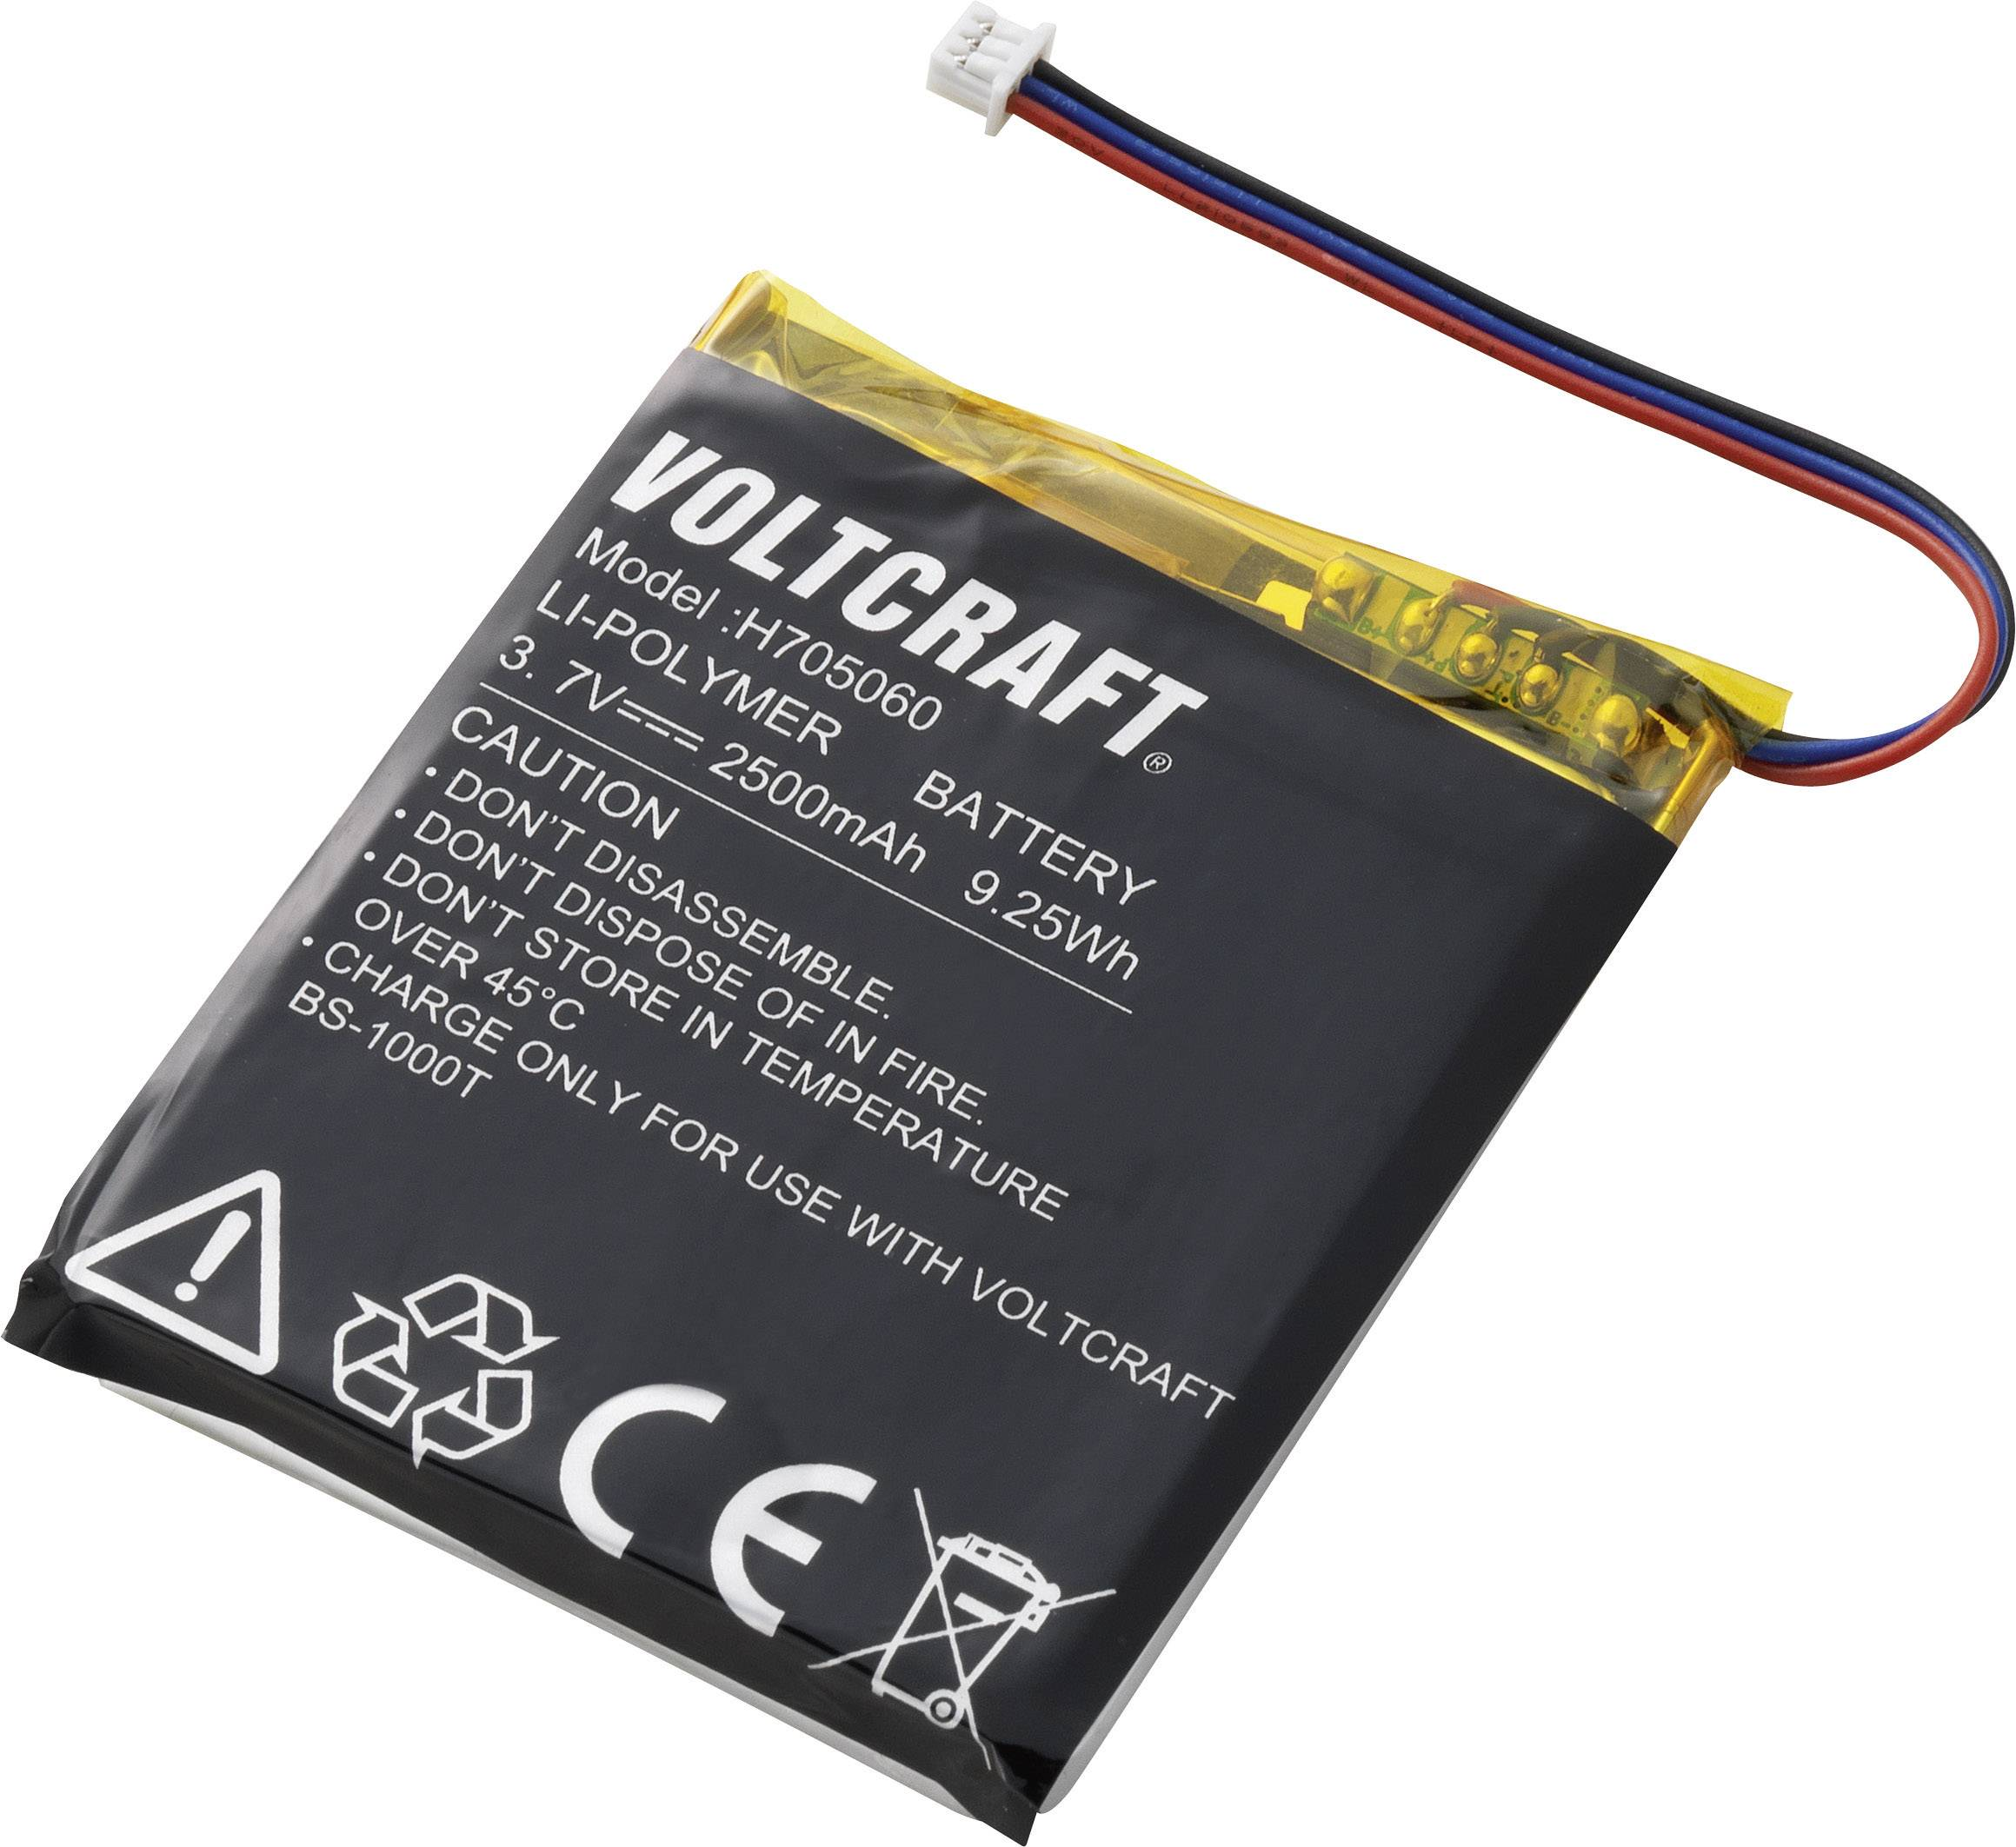 Náhradní akumulátor Voltcraft BS-BAT pro endoskop BS-1000T